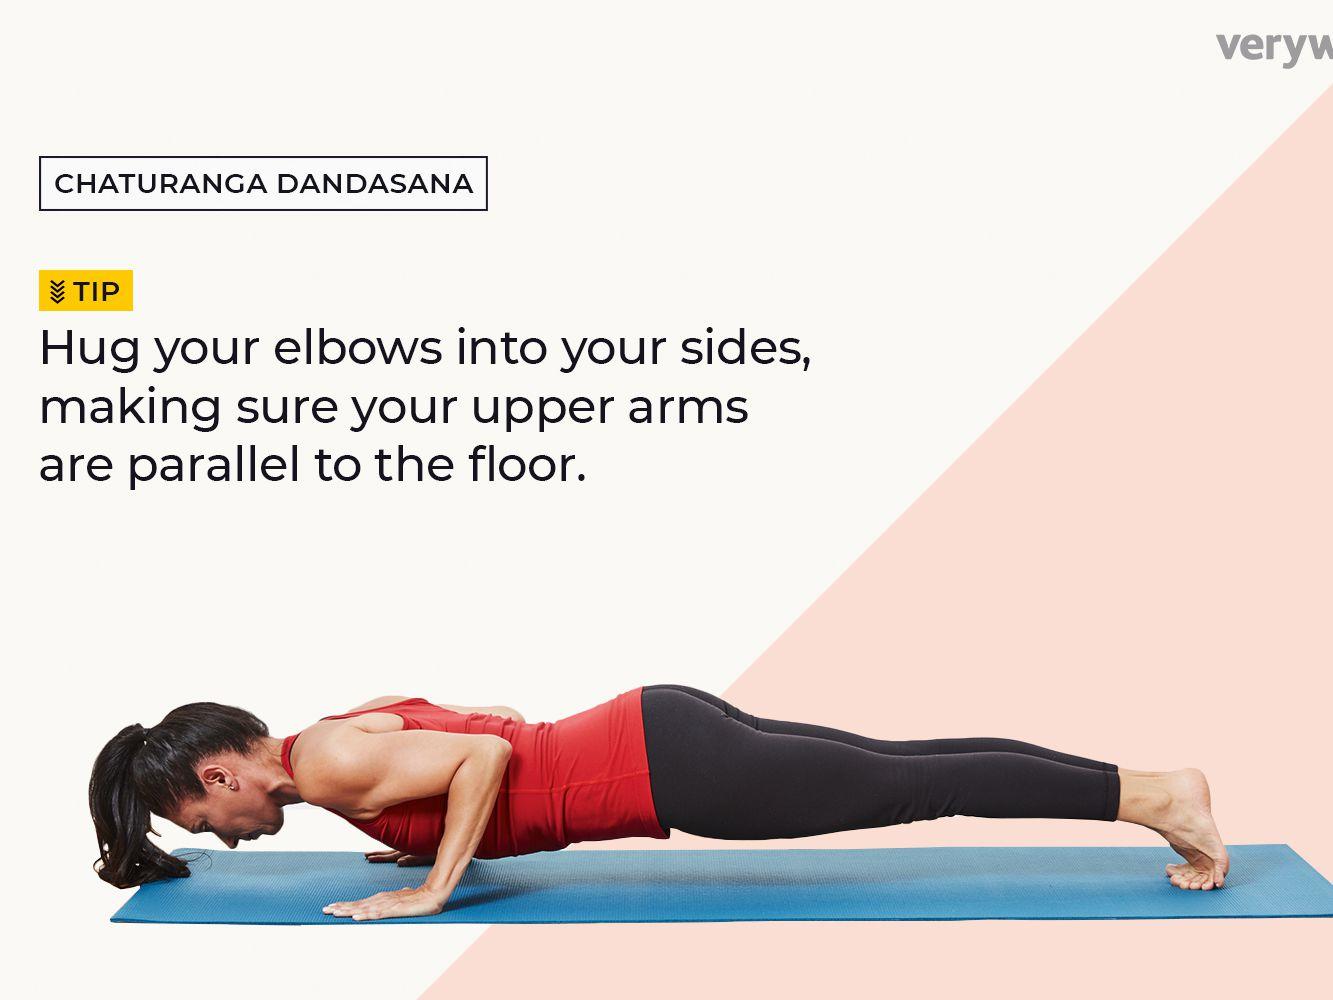 How To Do Low Plank Chaturanga Dandasana